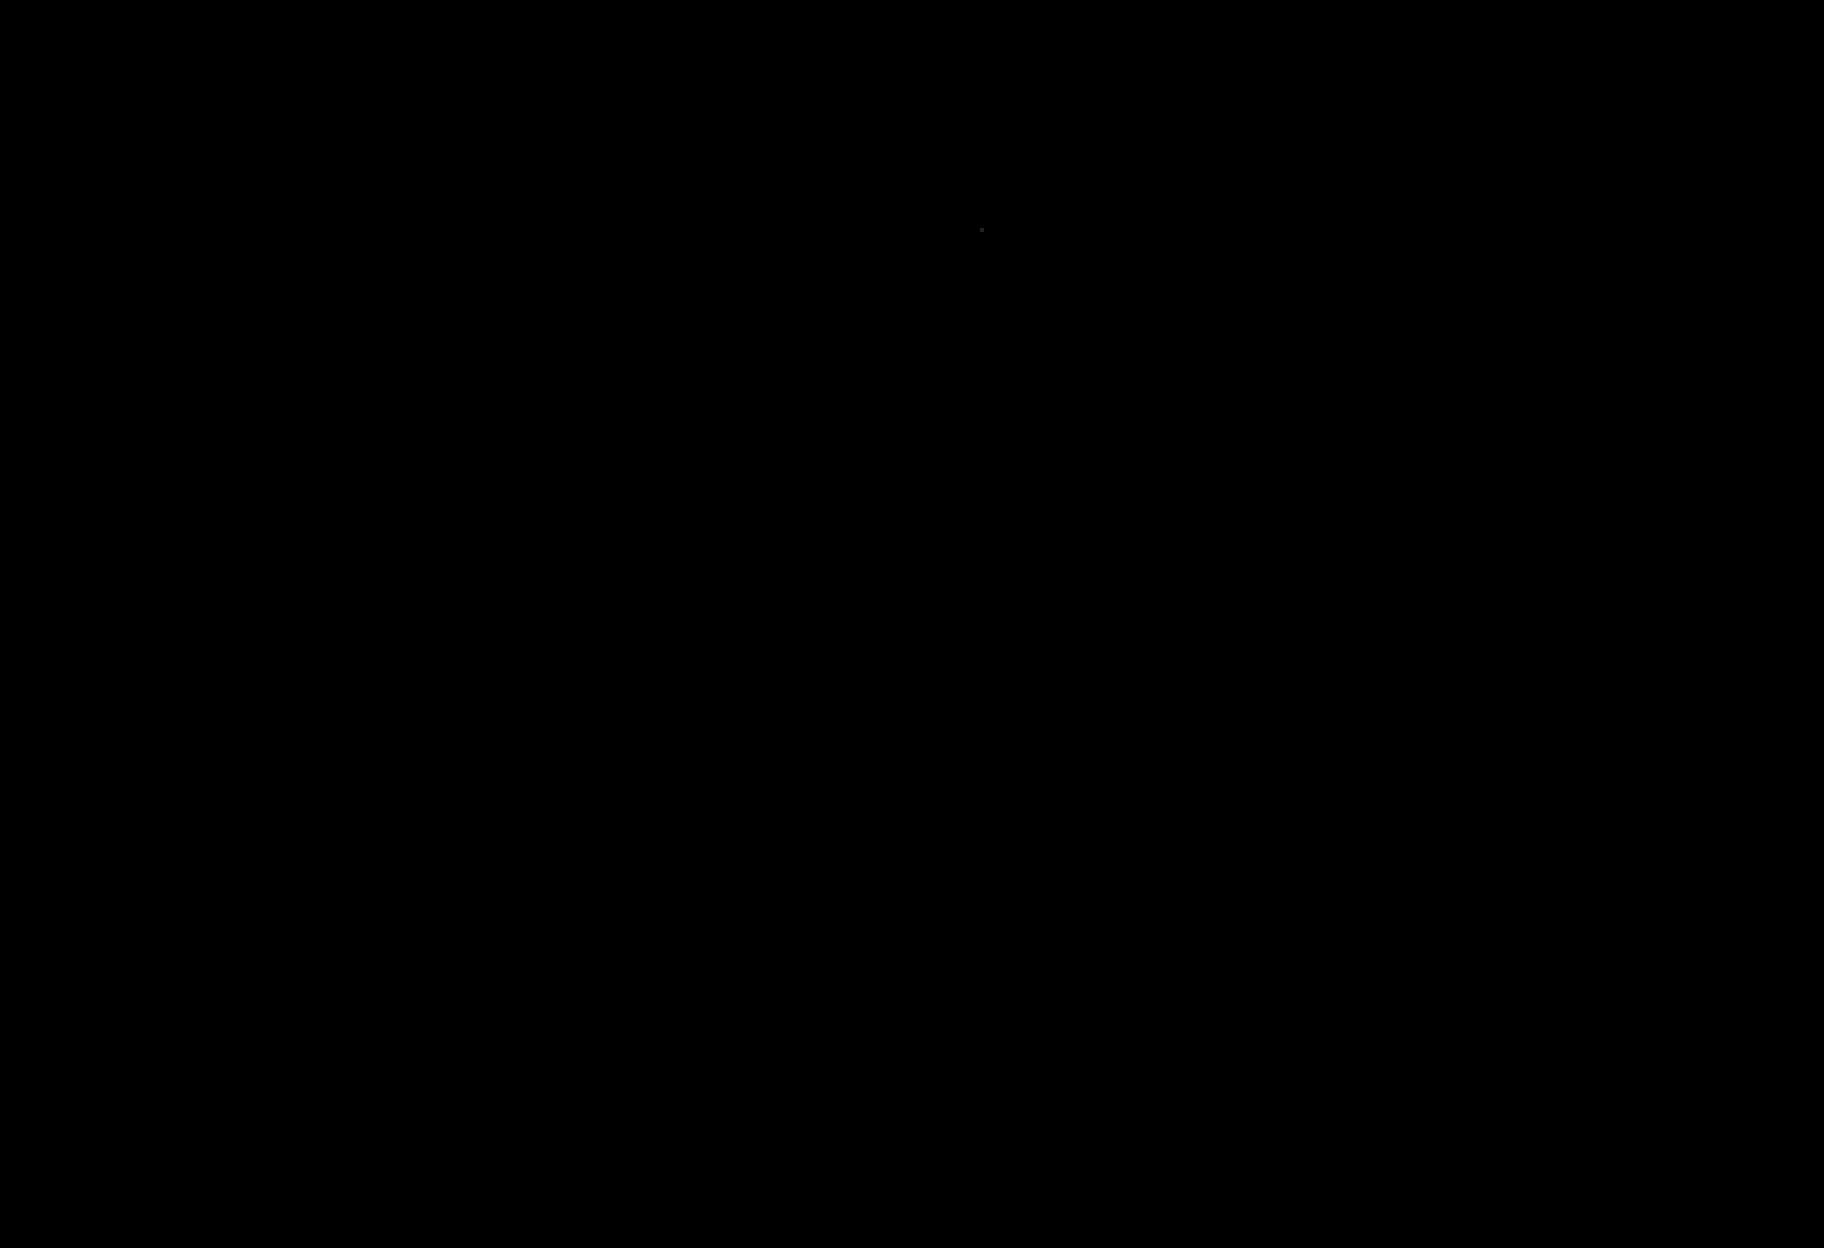 icon Retro